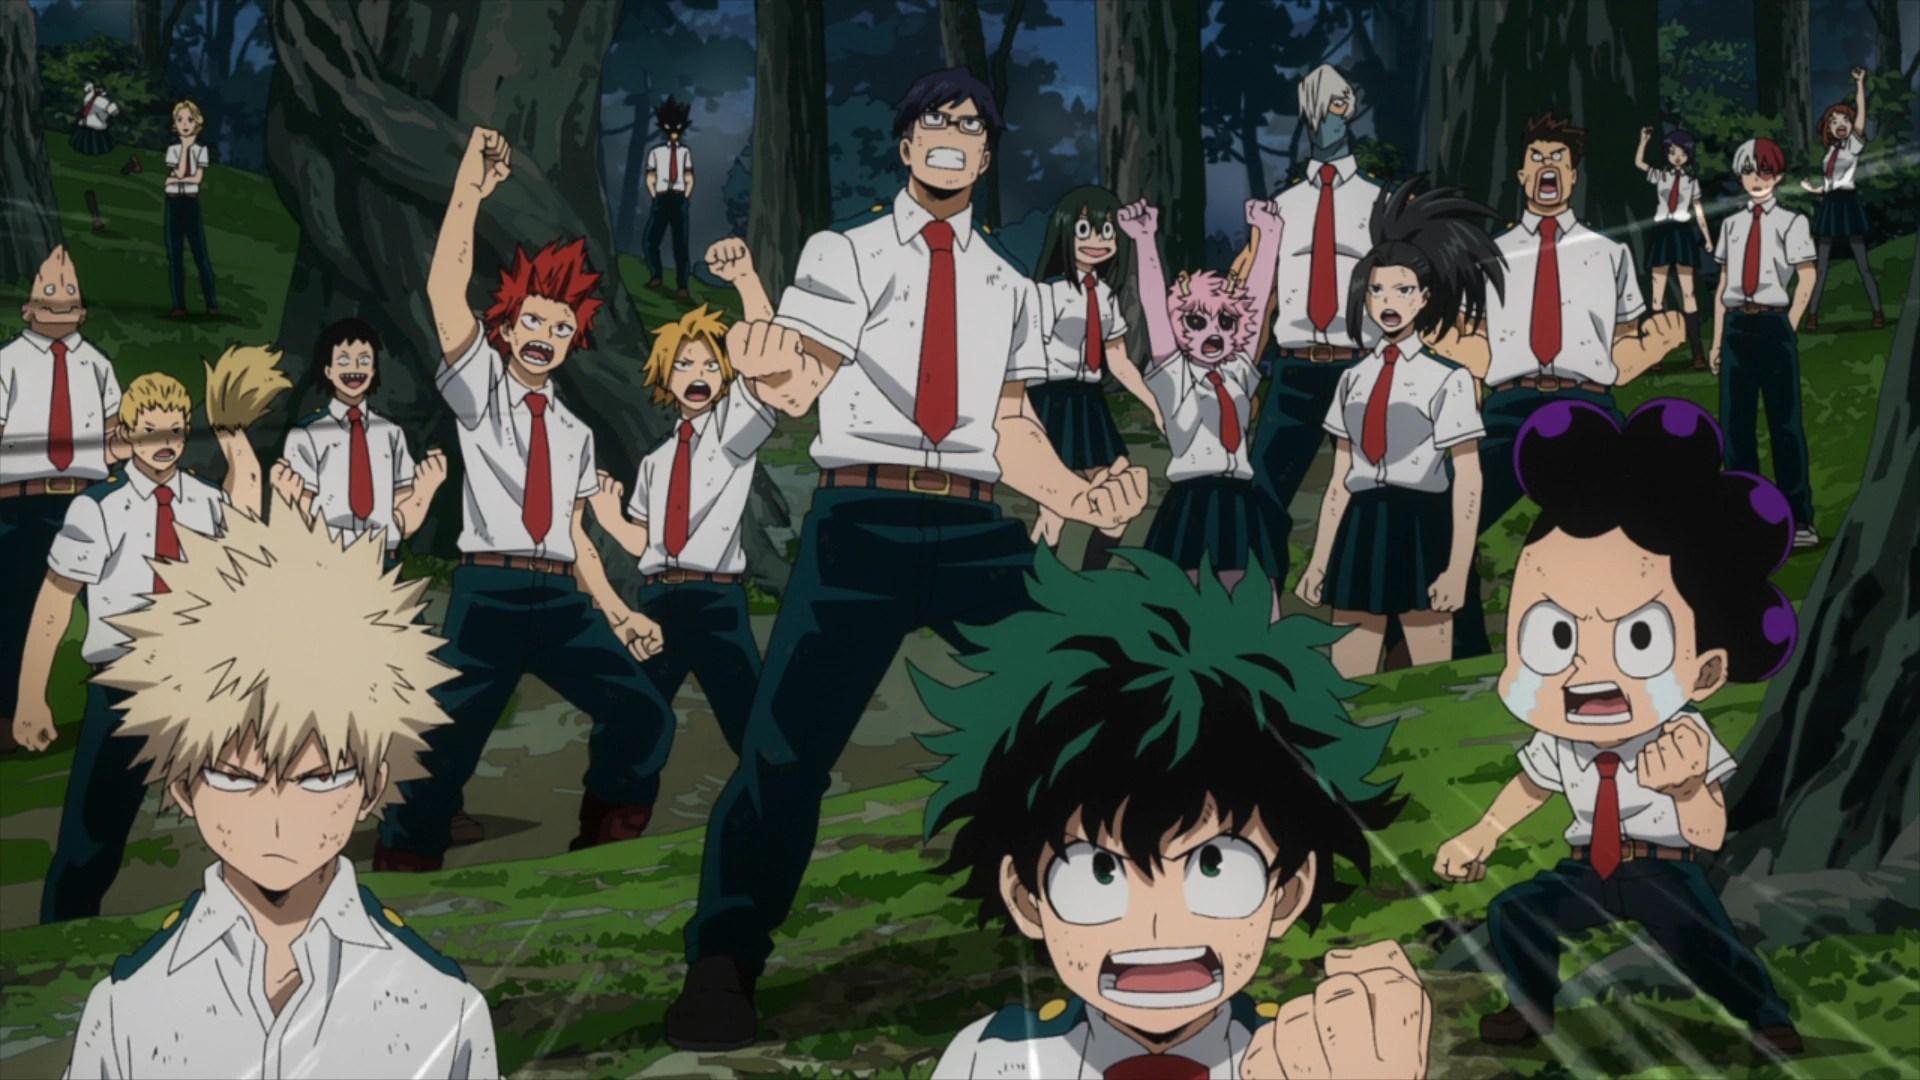 Wallpaper Engine Gun Anime Girl Forest Training Camp Arc Boku No Hero Academia Wiki